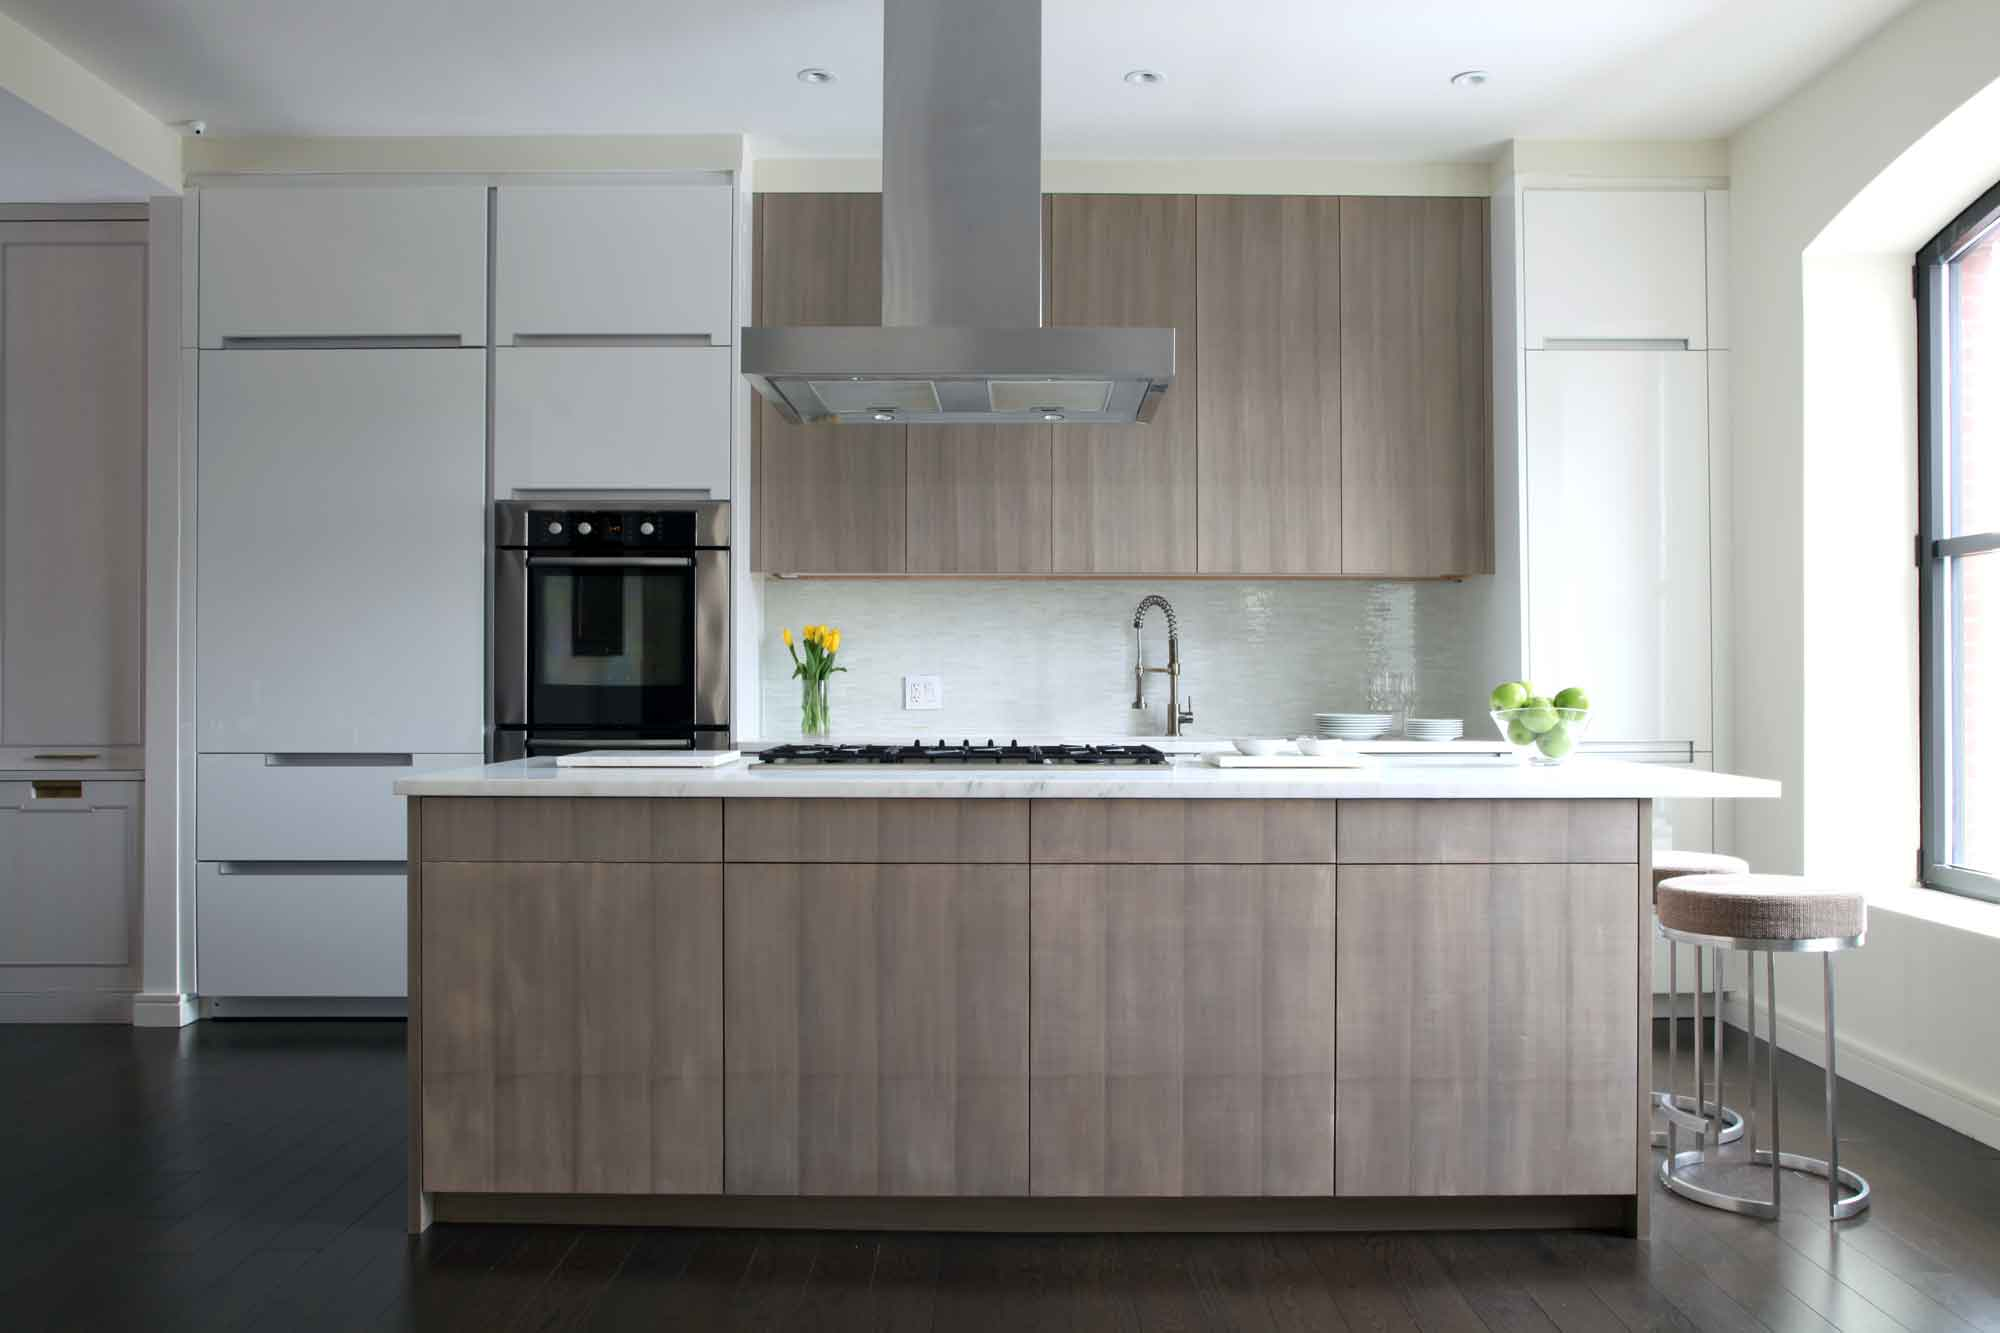 brooke moorhead design kitchen tribeca chic